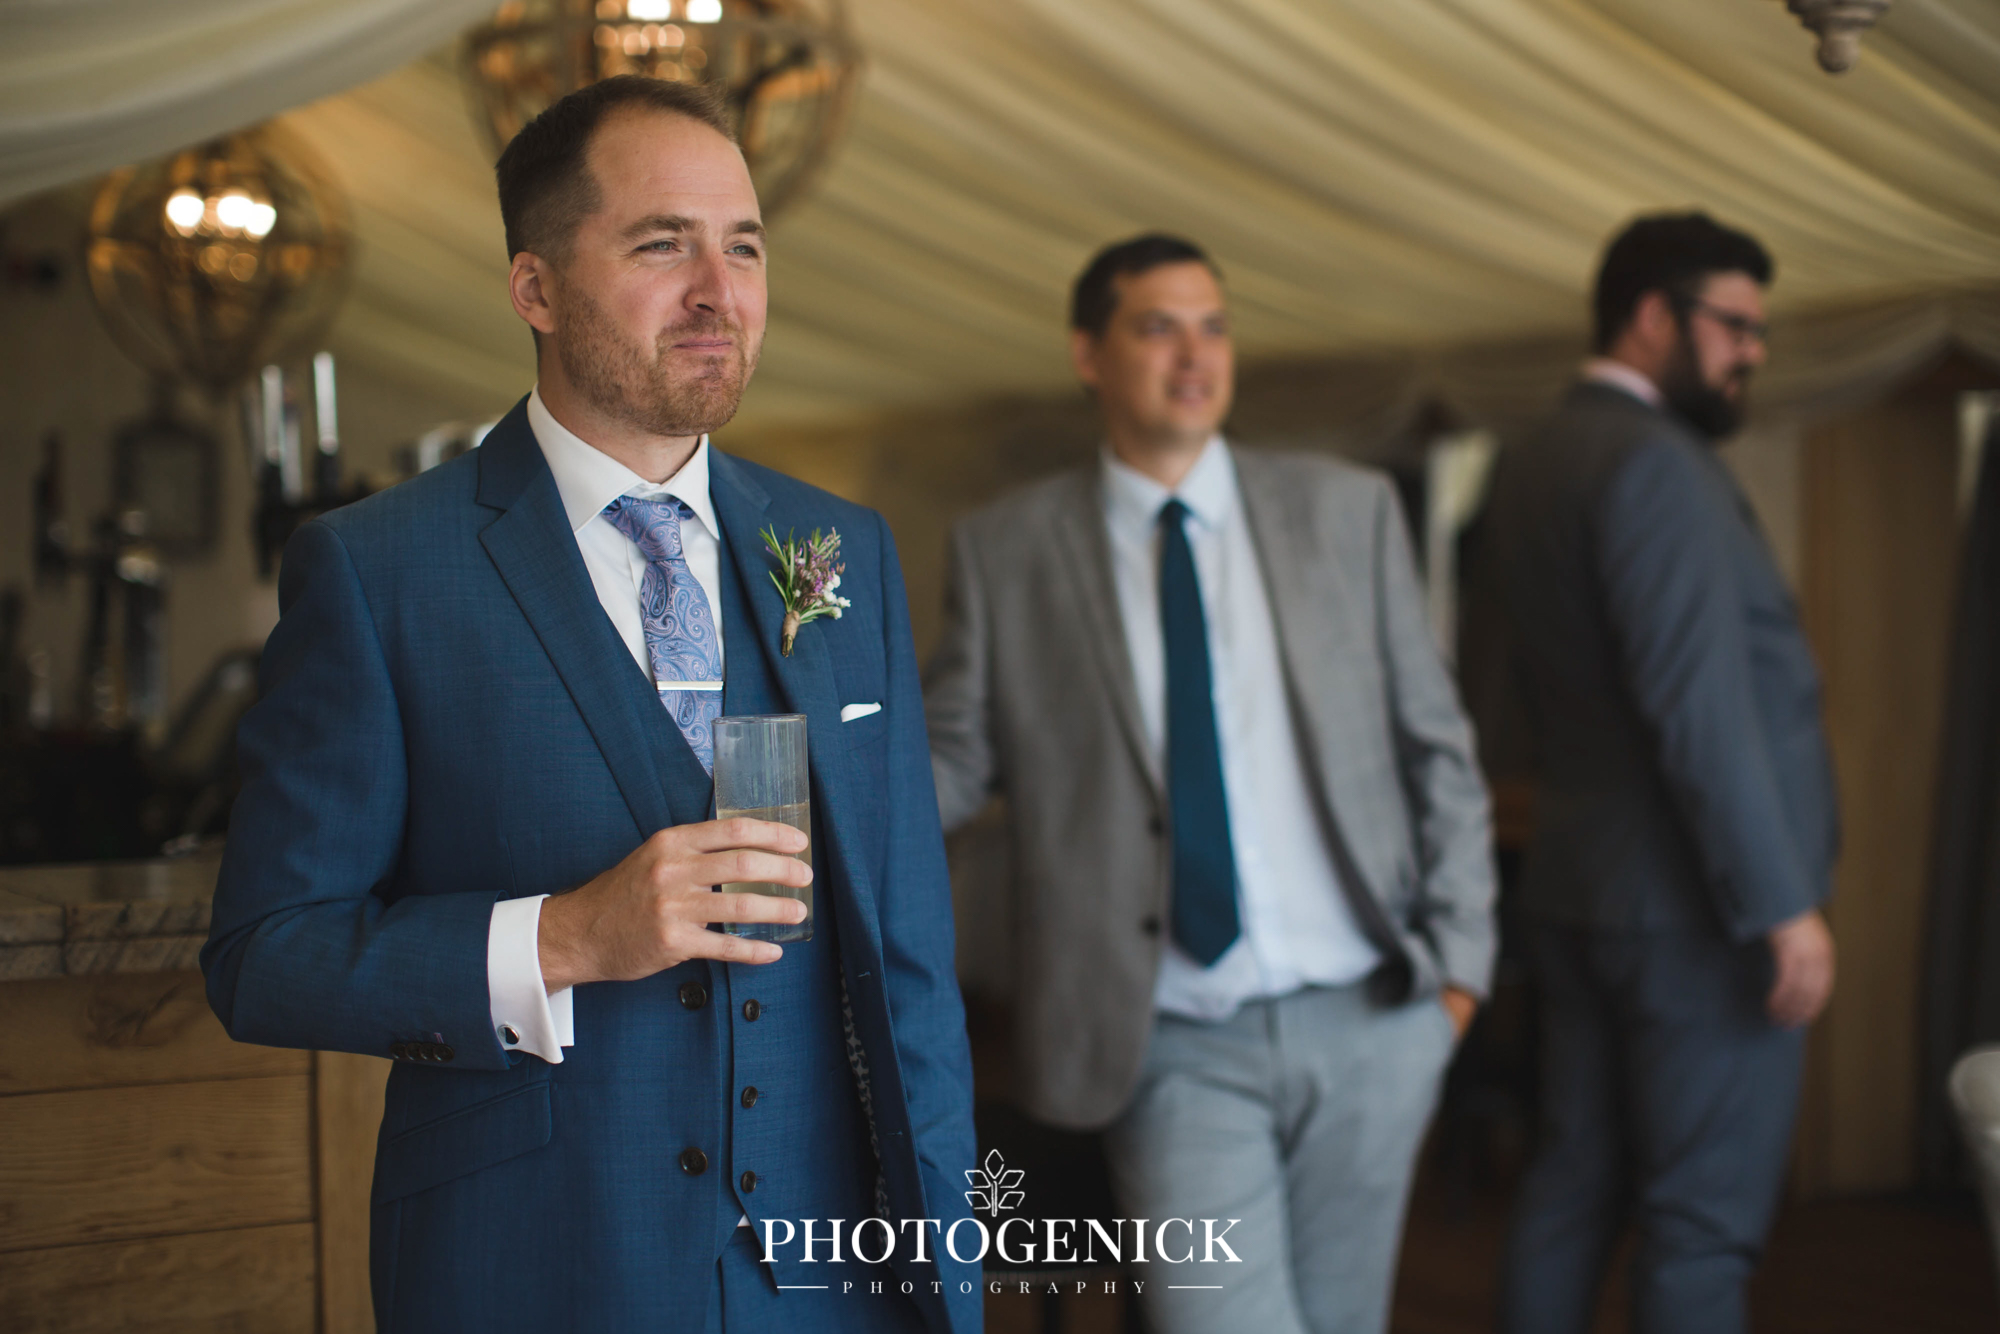 oldwalls gower wedding photographers-9.jpg